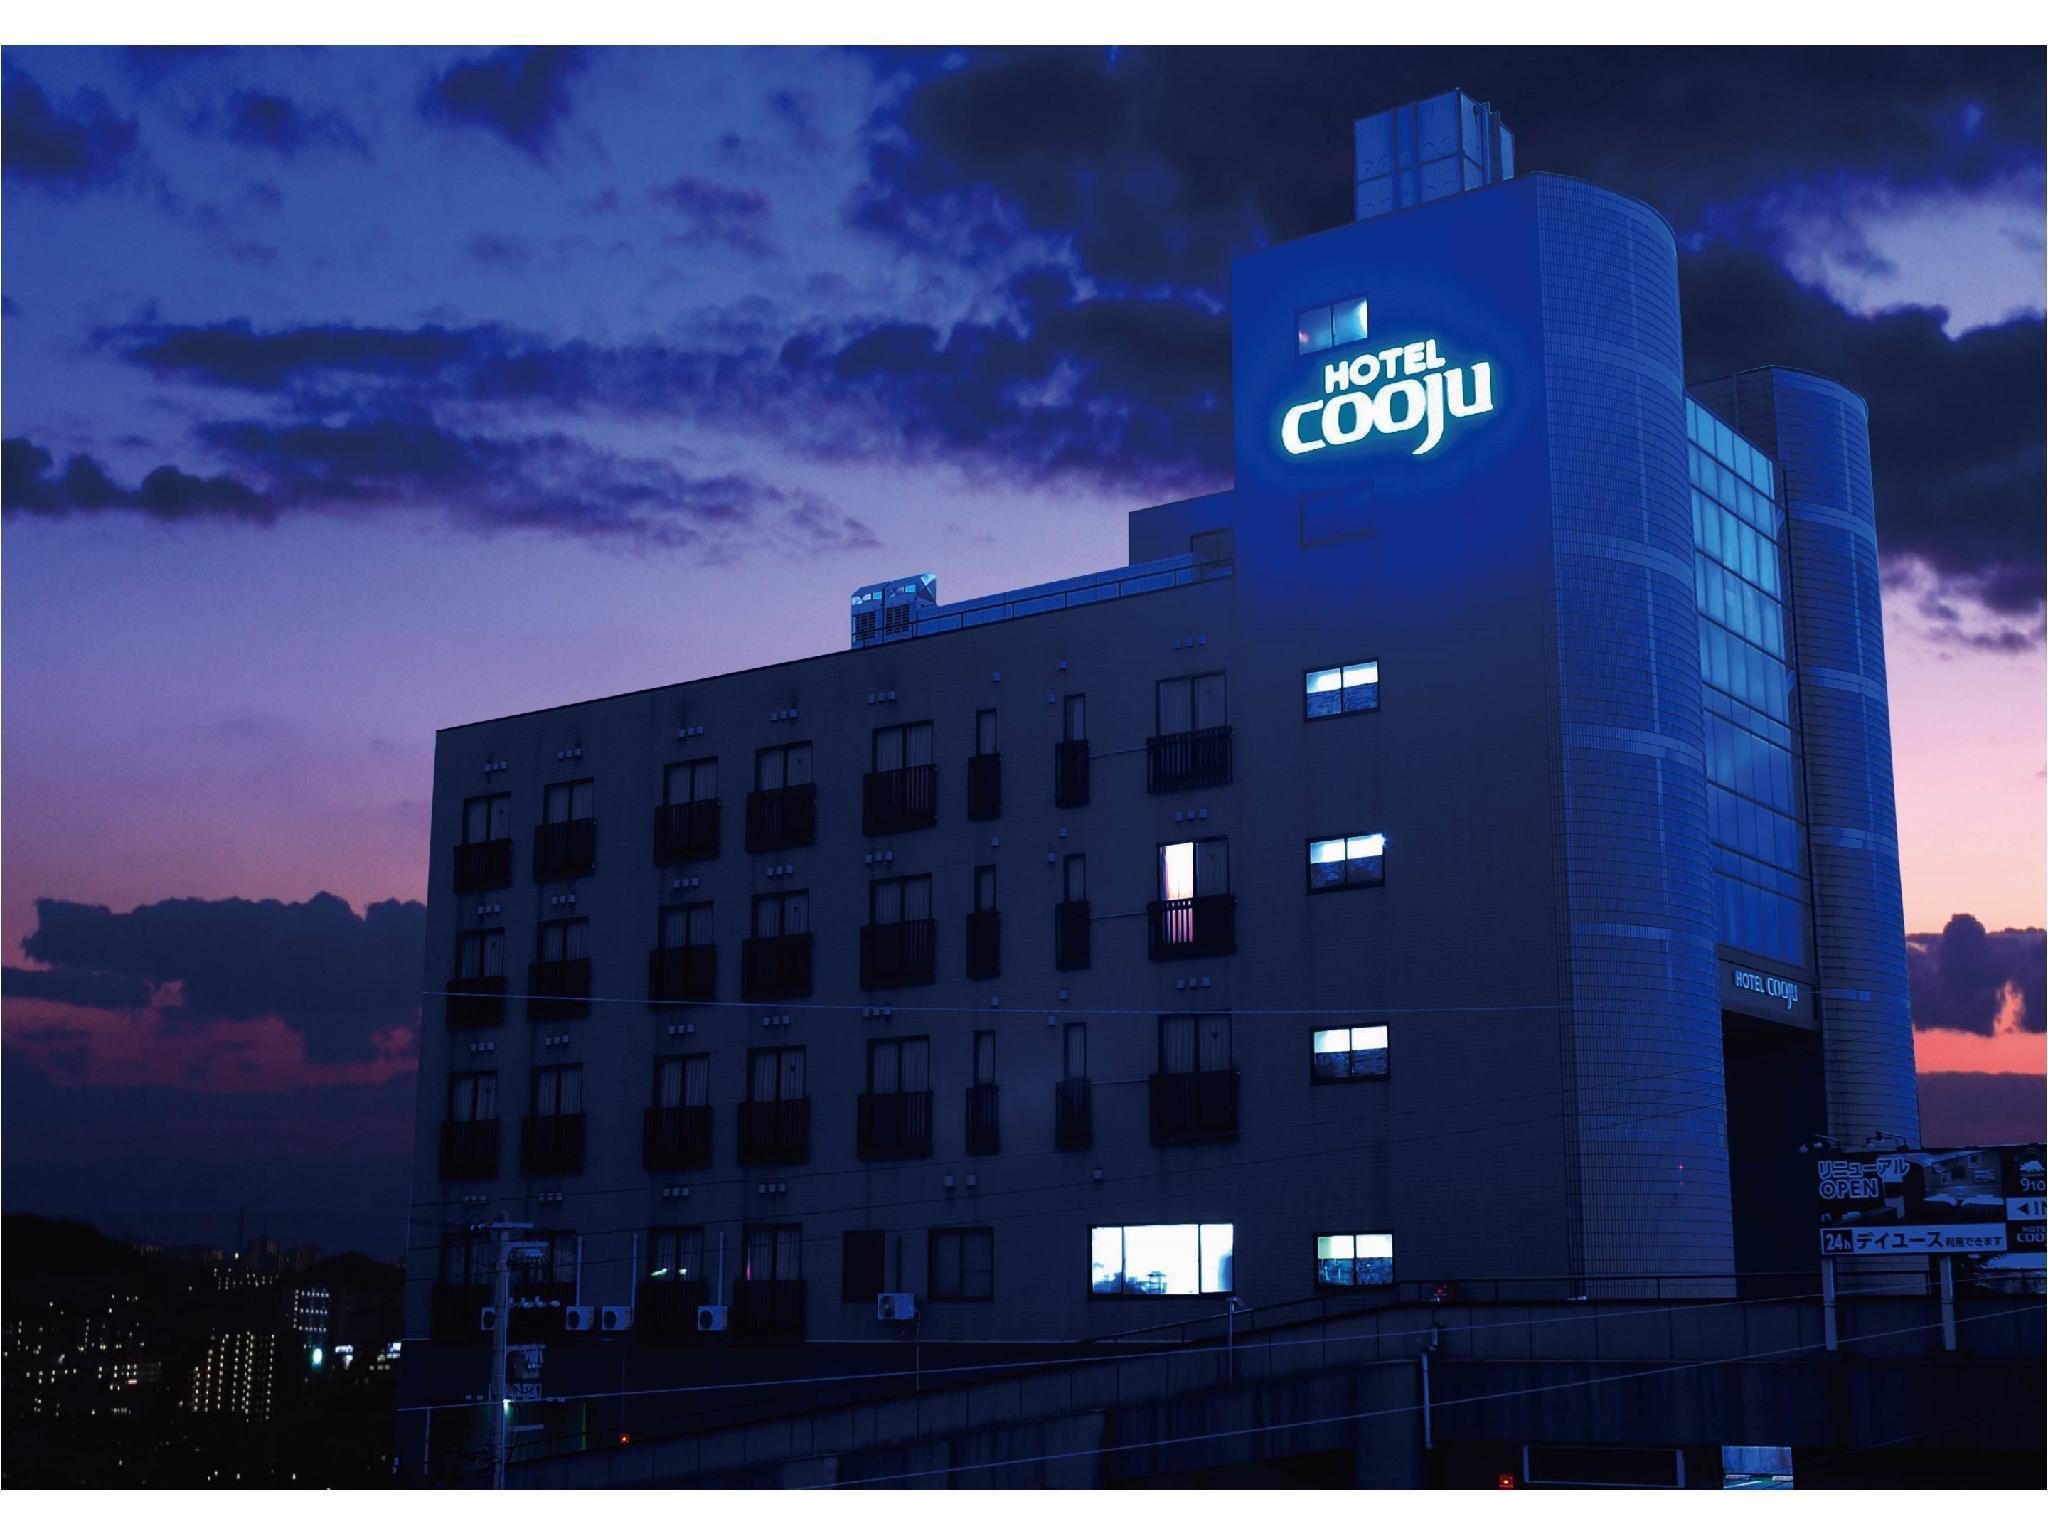 Hotel Cooju Fukui